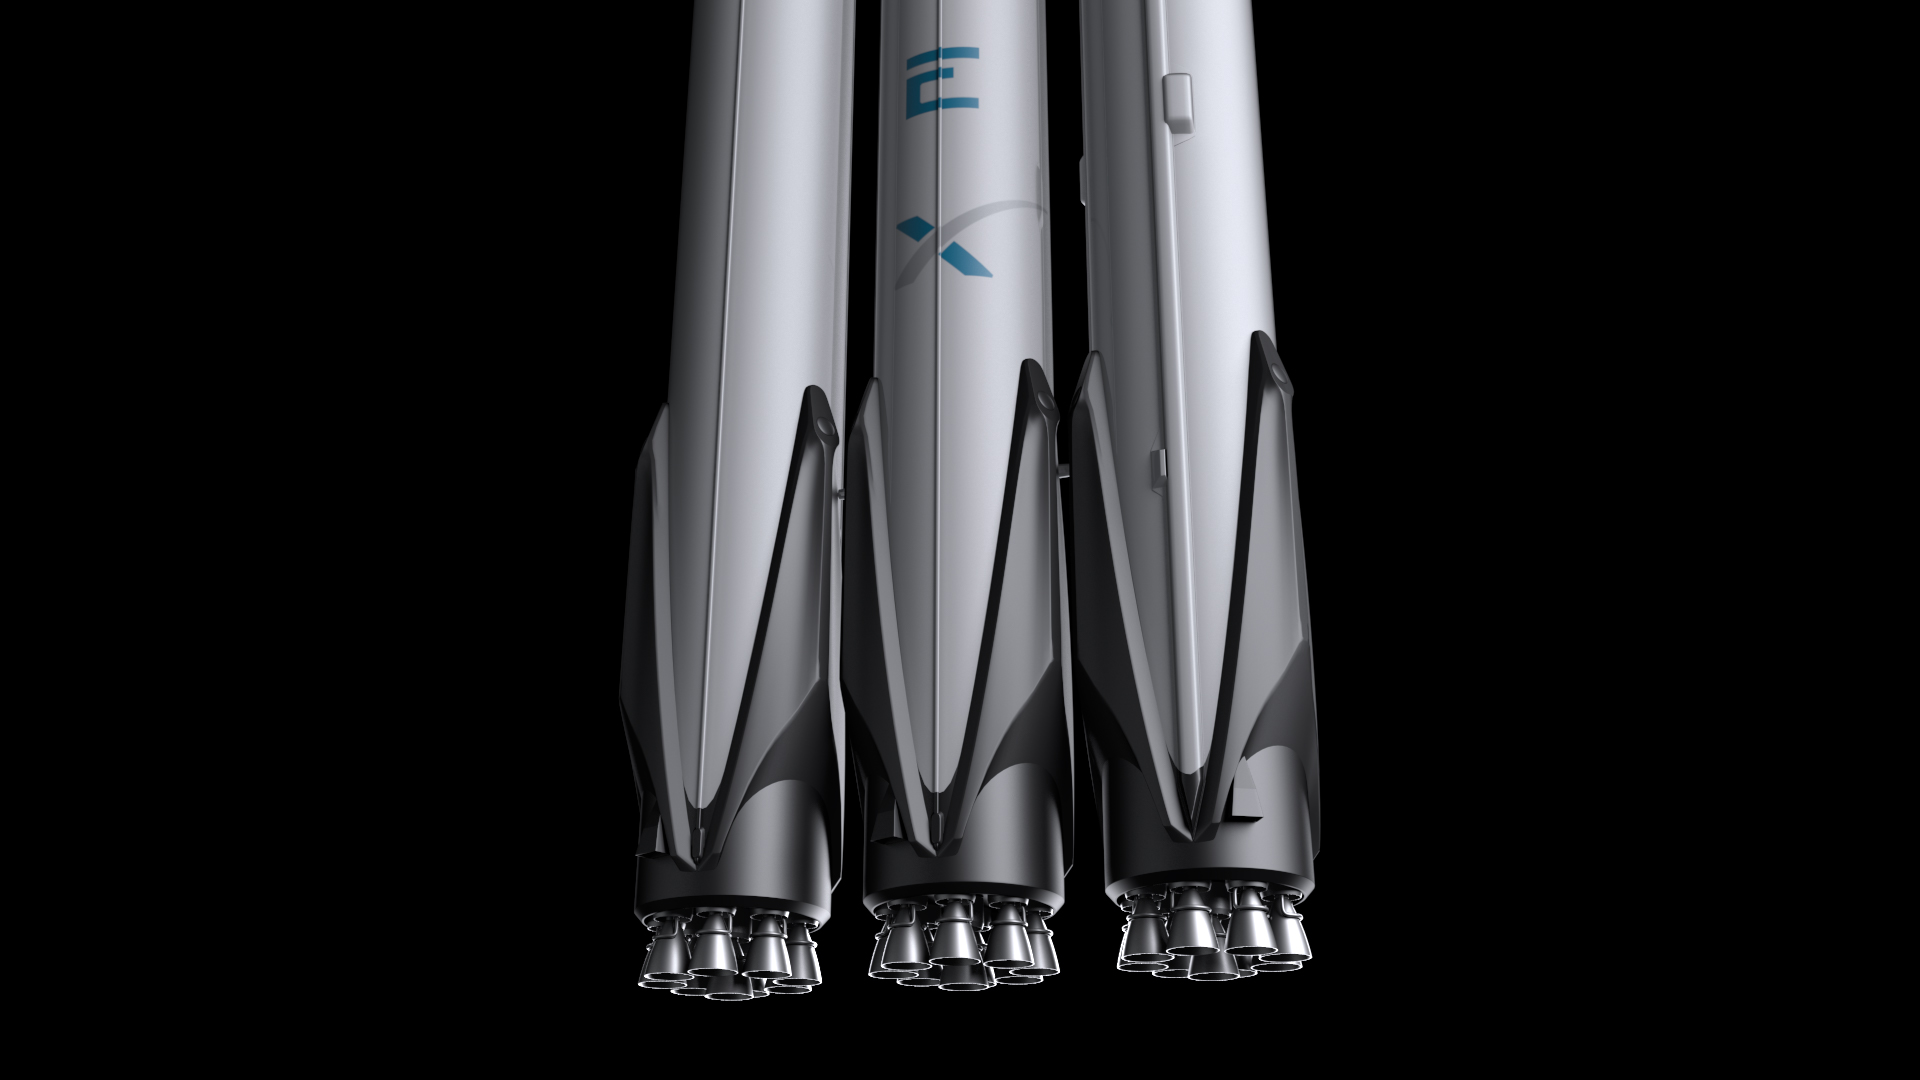 falcon heavy v1.2 fully reusable 3d model max fbx c4d lwo ma mb hrc xsi obj 277861